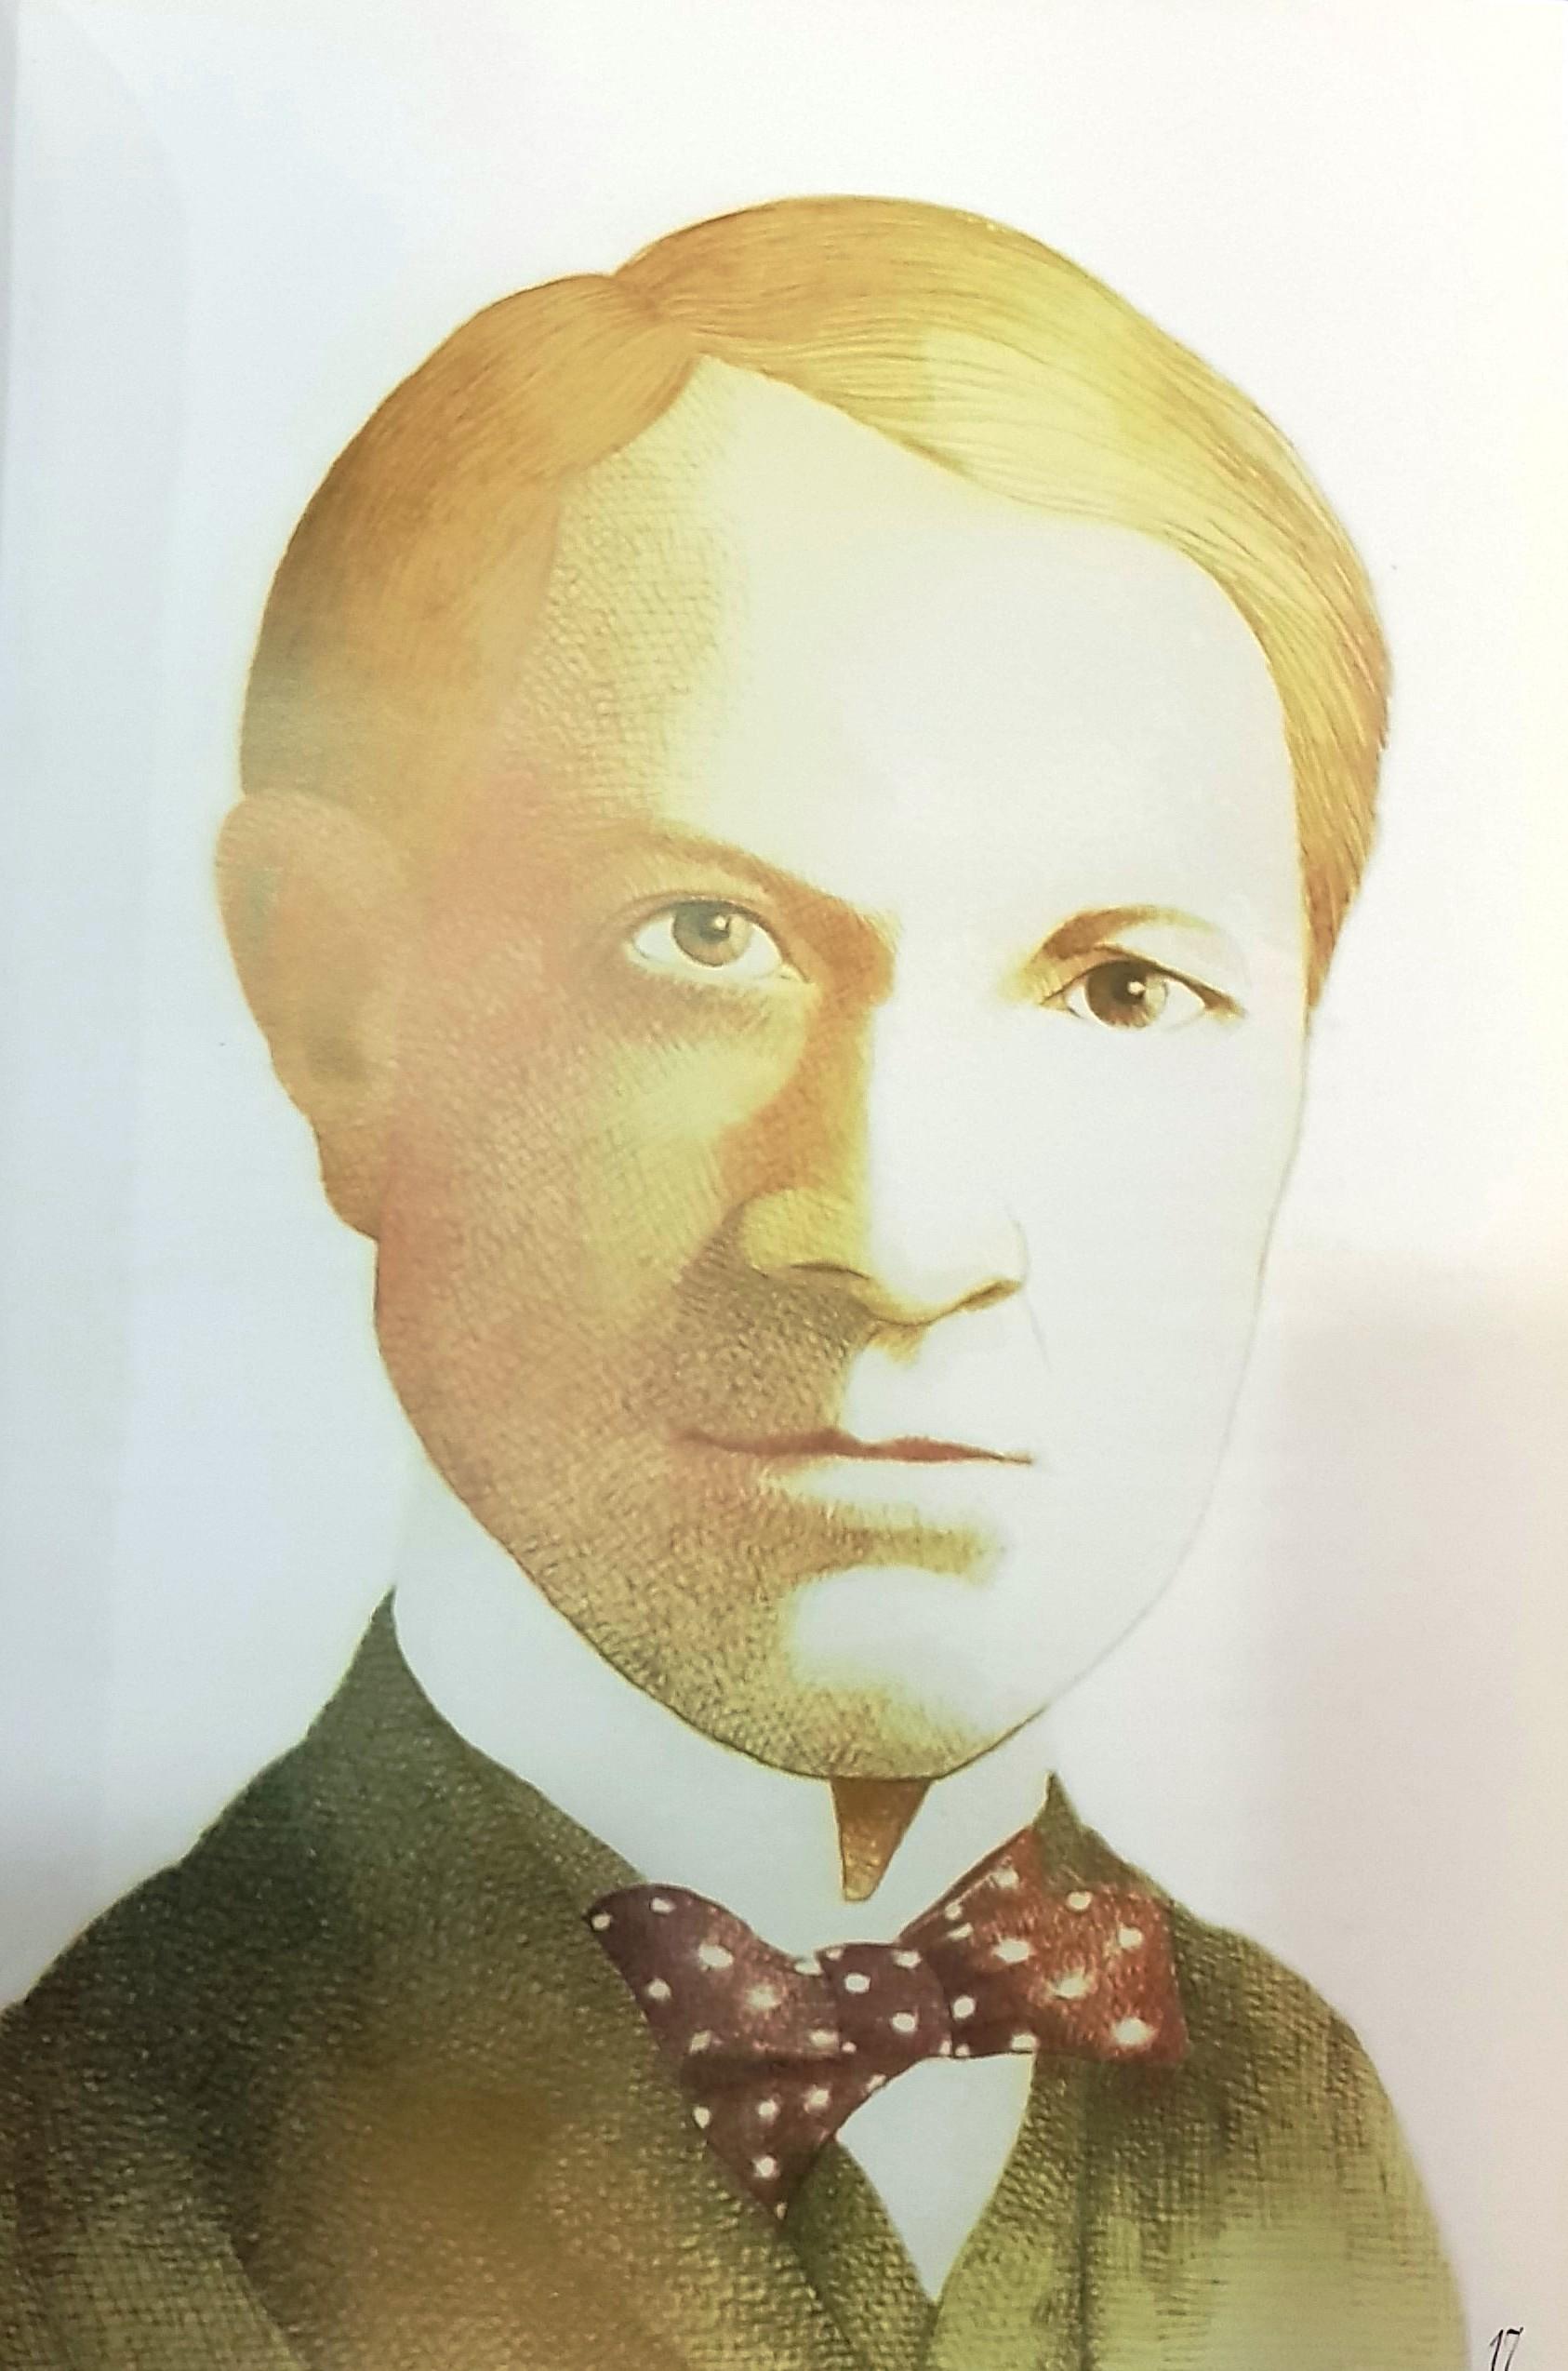 DR. HARALD SEIDELIN